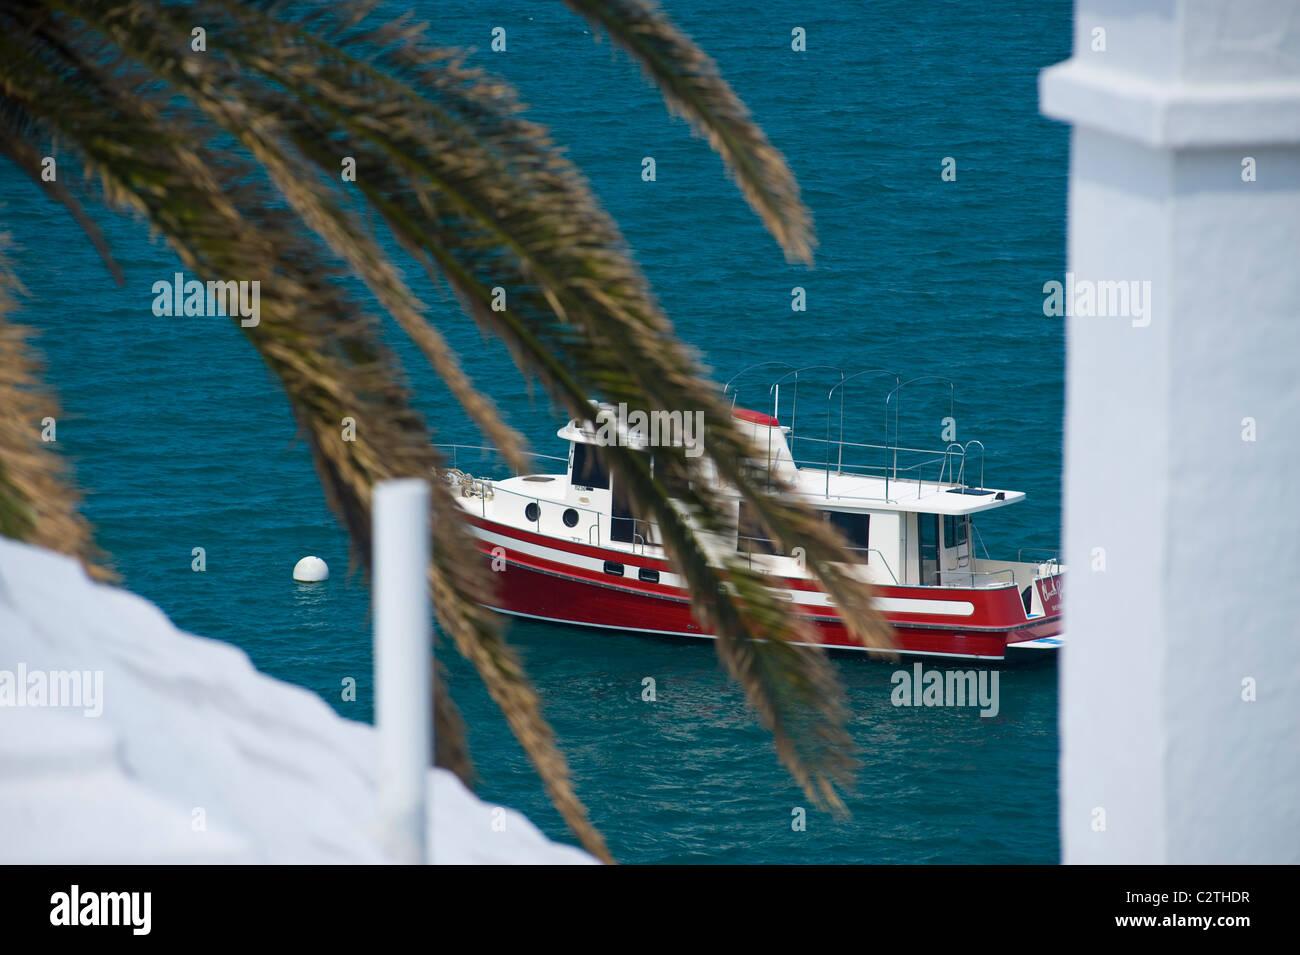 Boat moored in Hamilton Harbour, Hamilton, Bermuda - building in foreground. - Stock Image